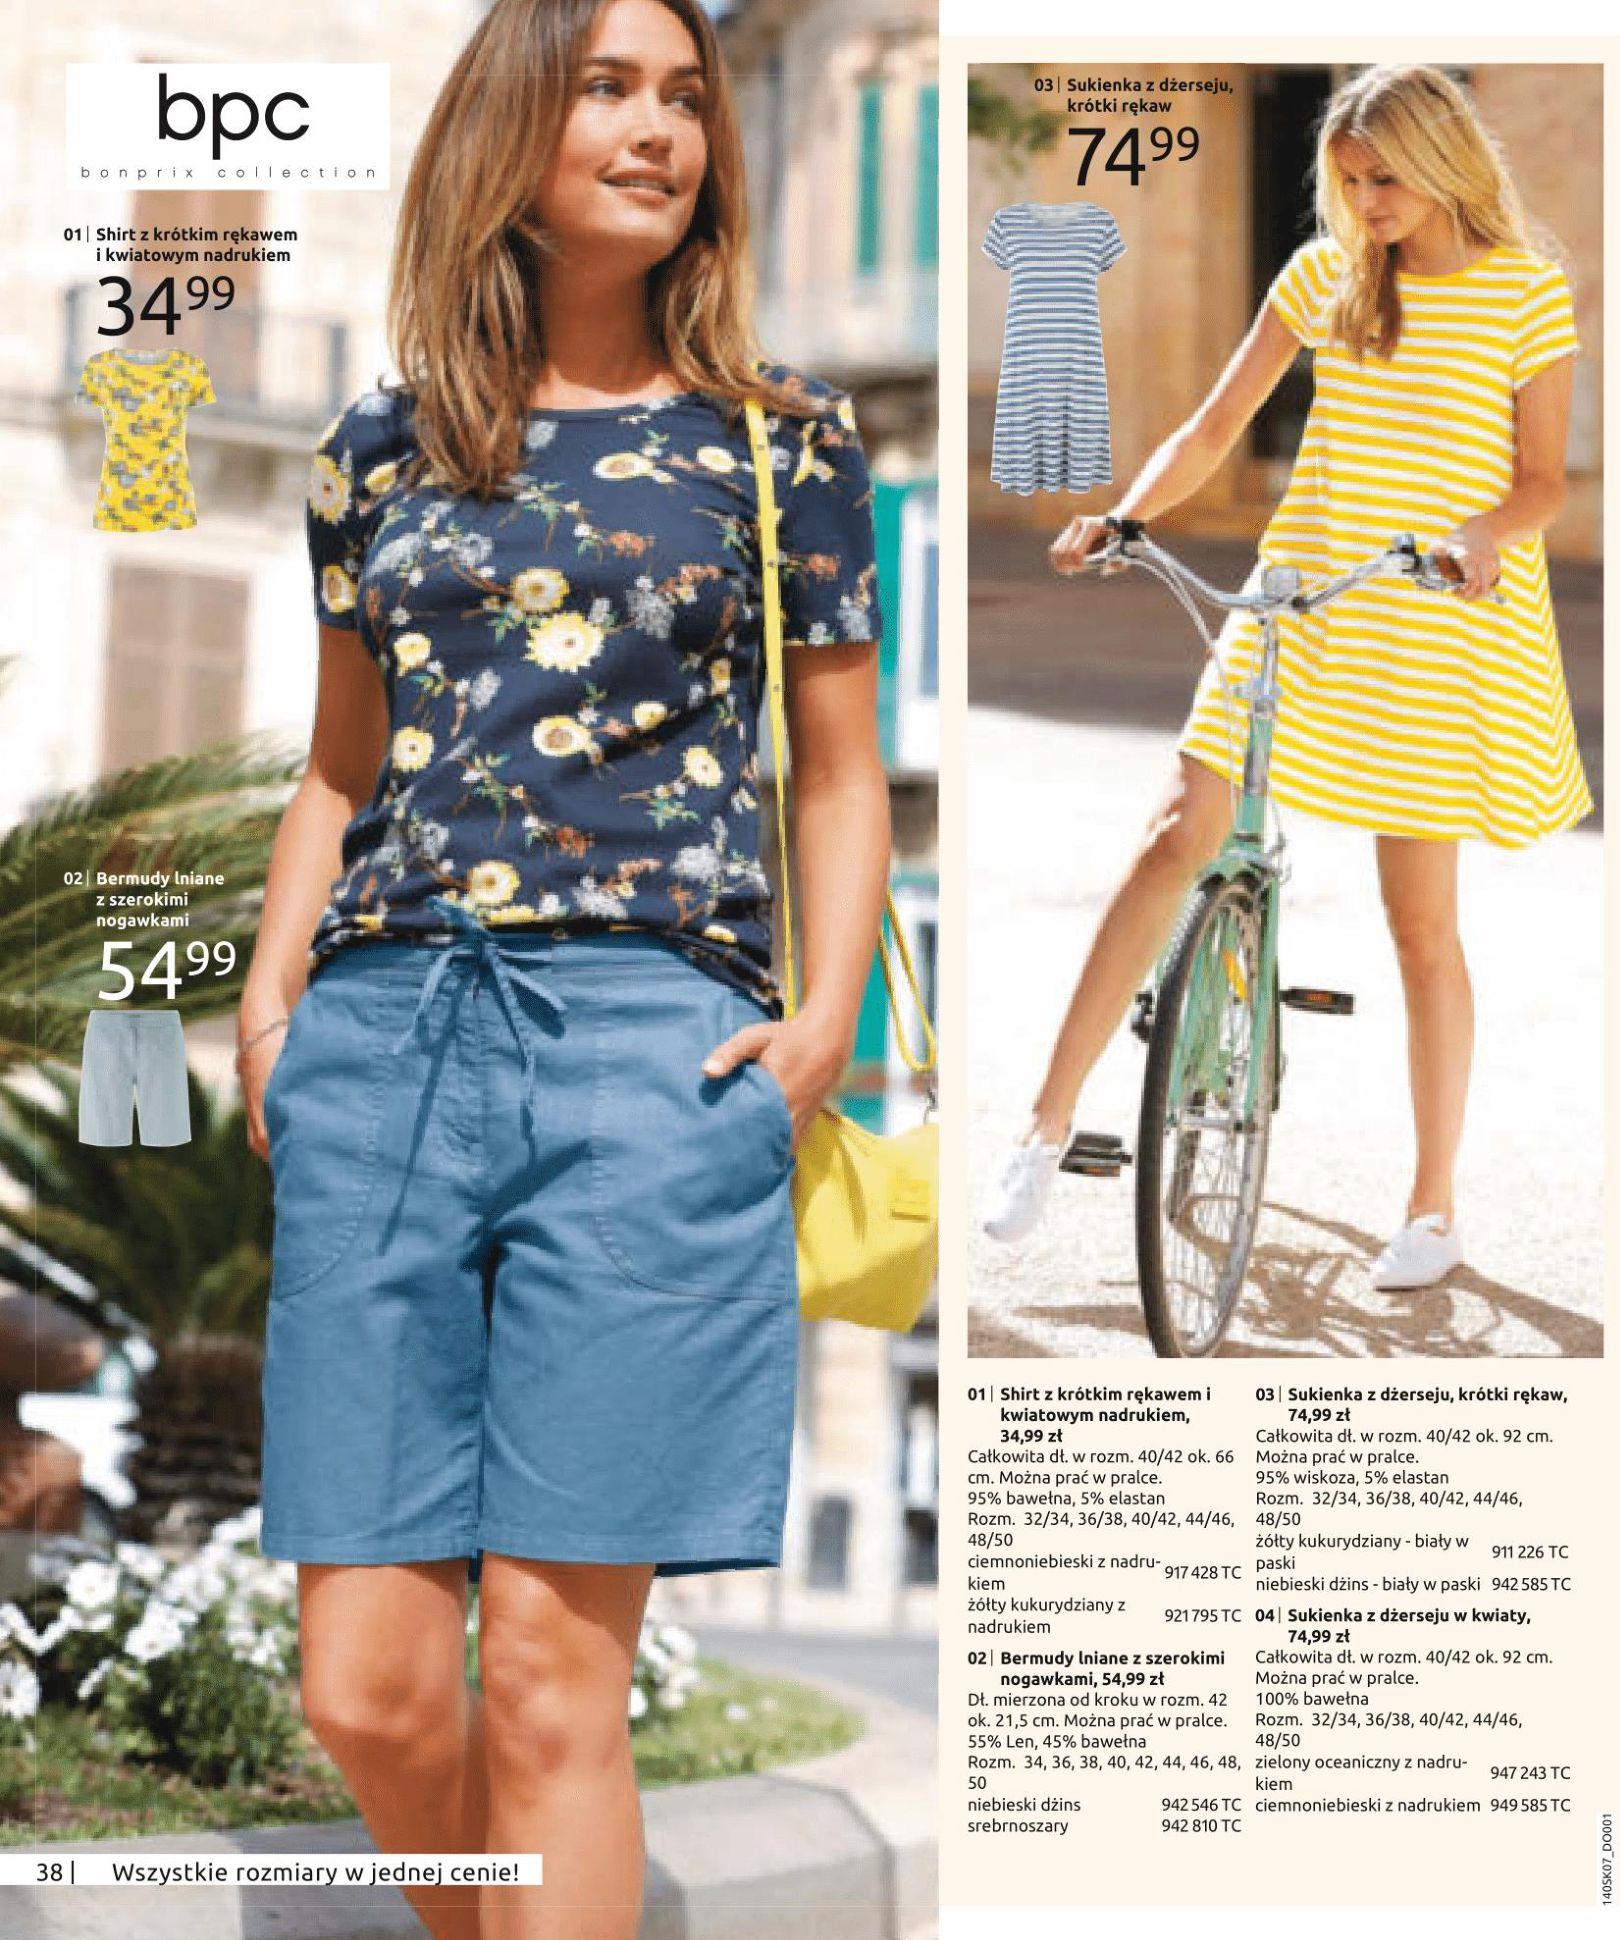 Gazetka Bonprix - Letnie trendy-02.07.2019-15.01.2020-page-40